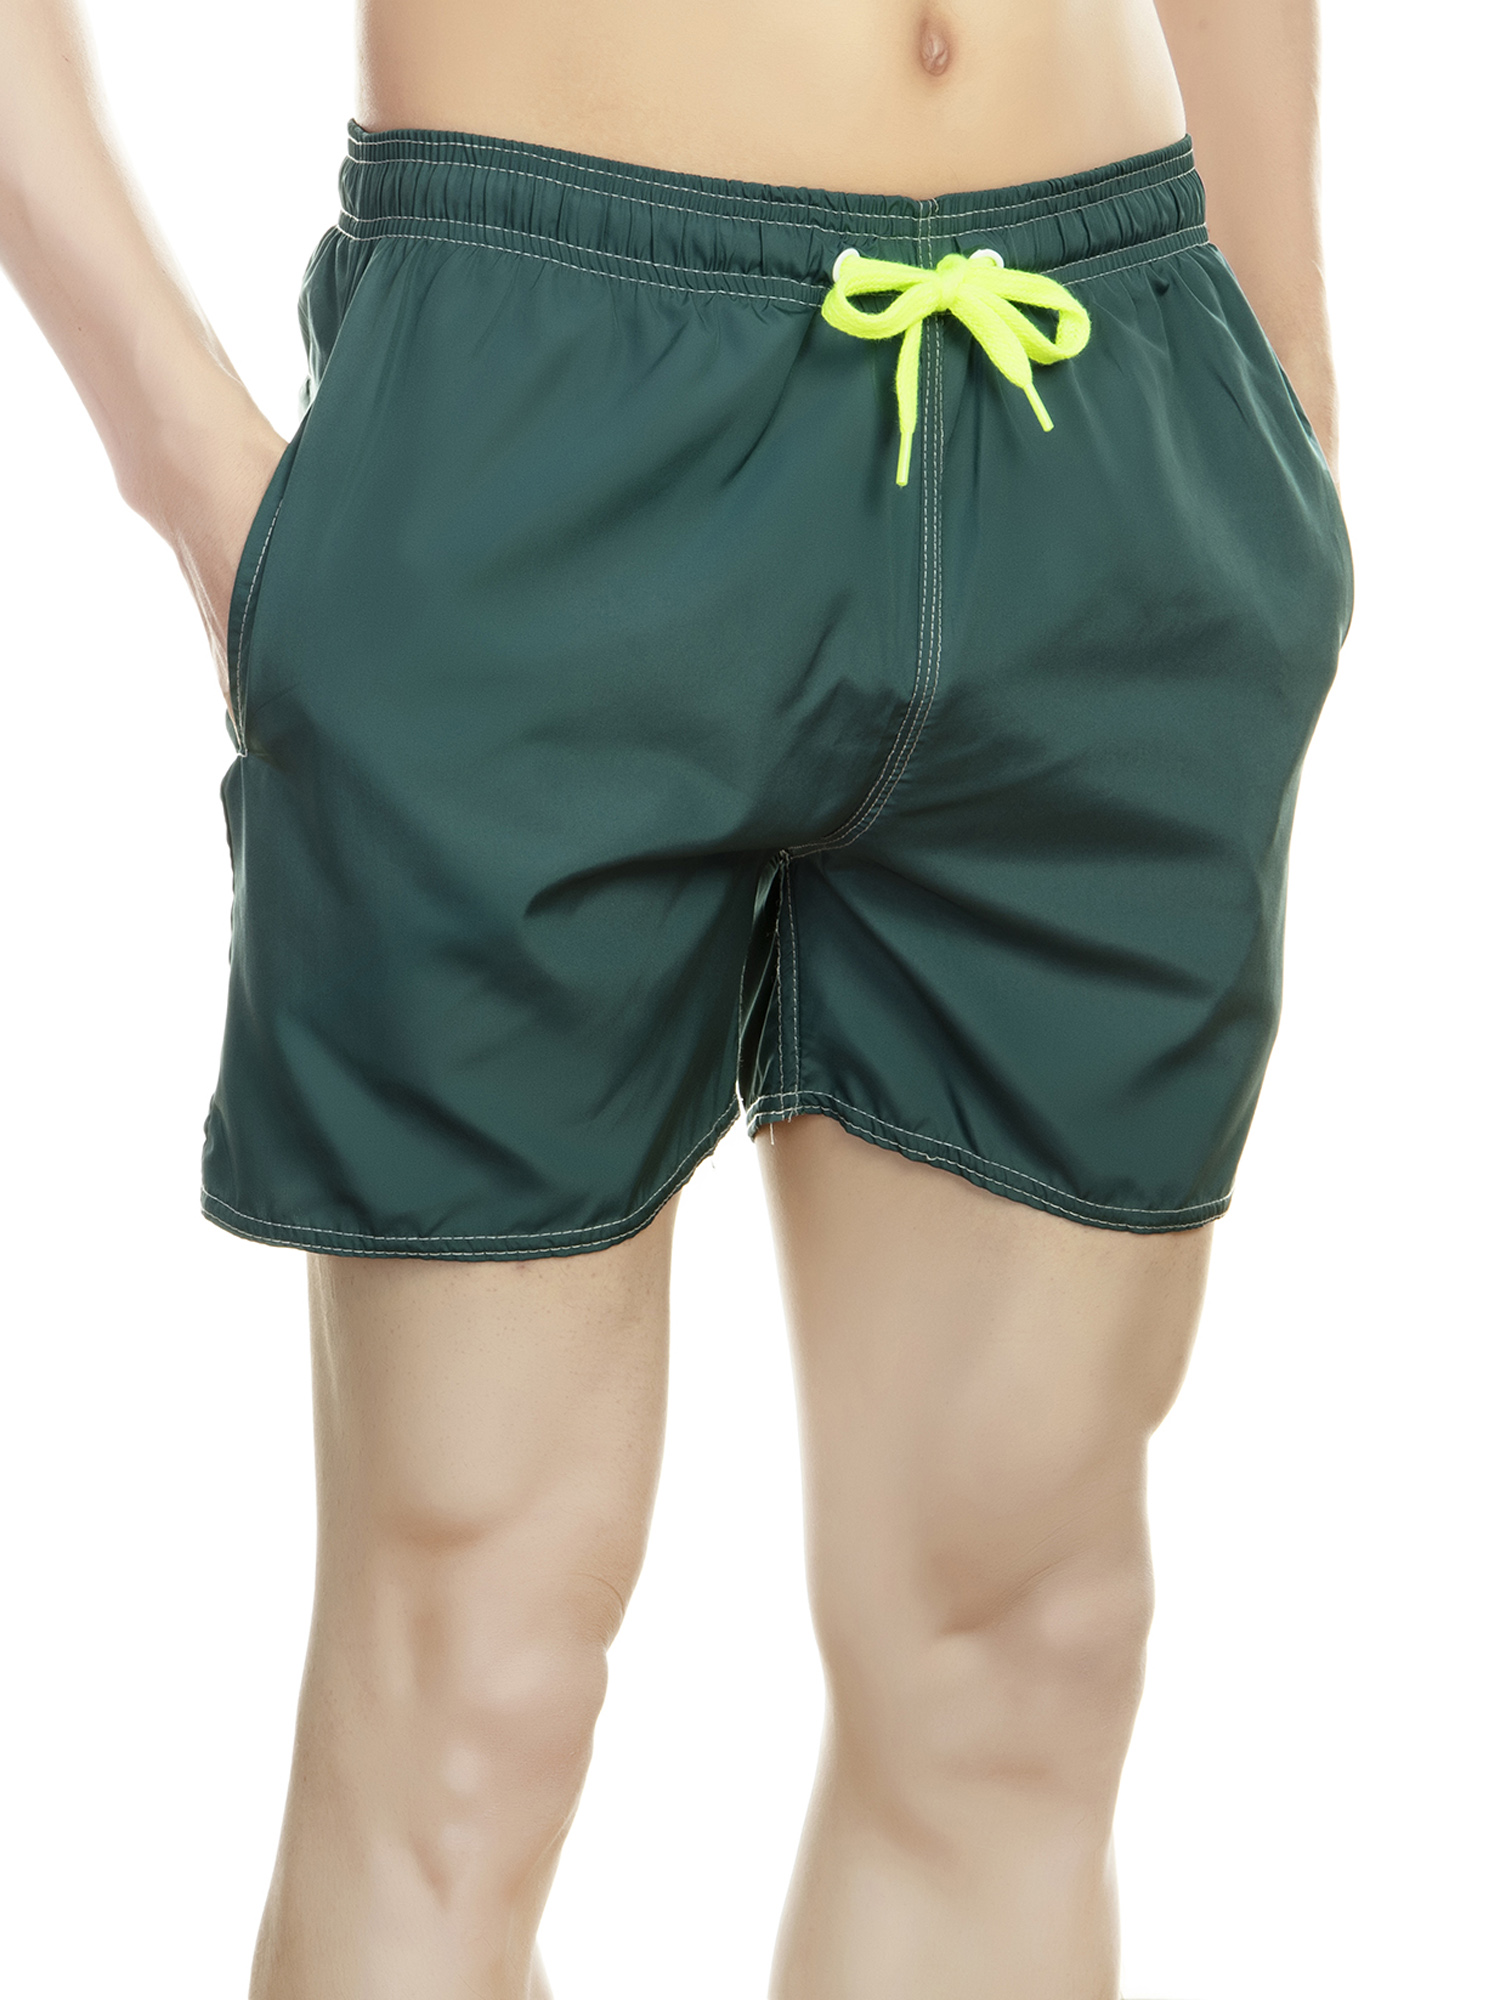 Swimsuit Beachwear Men Shorts Sports Pants Summer Boy Trunks Surf Board Shorts